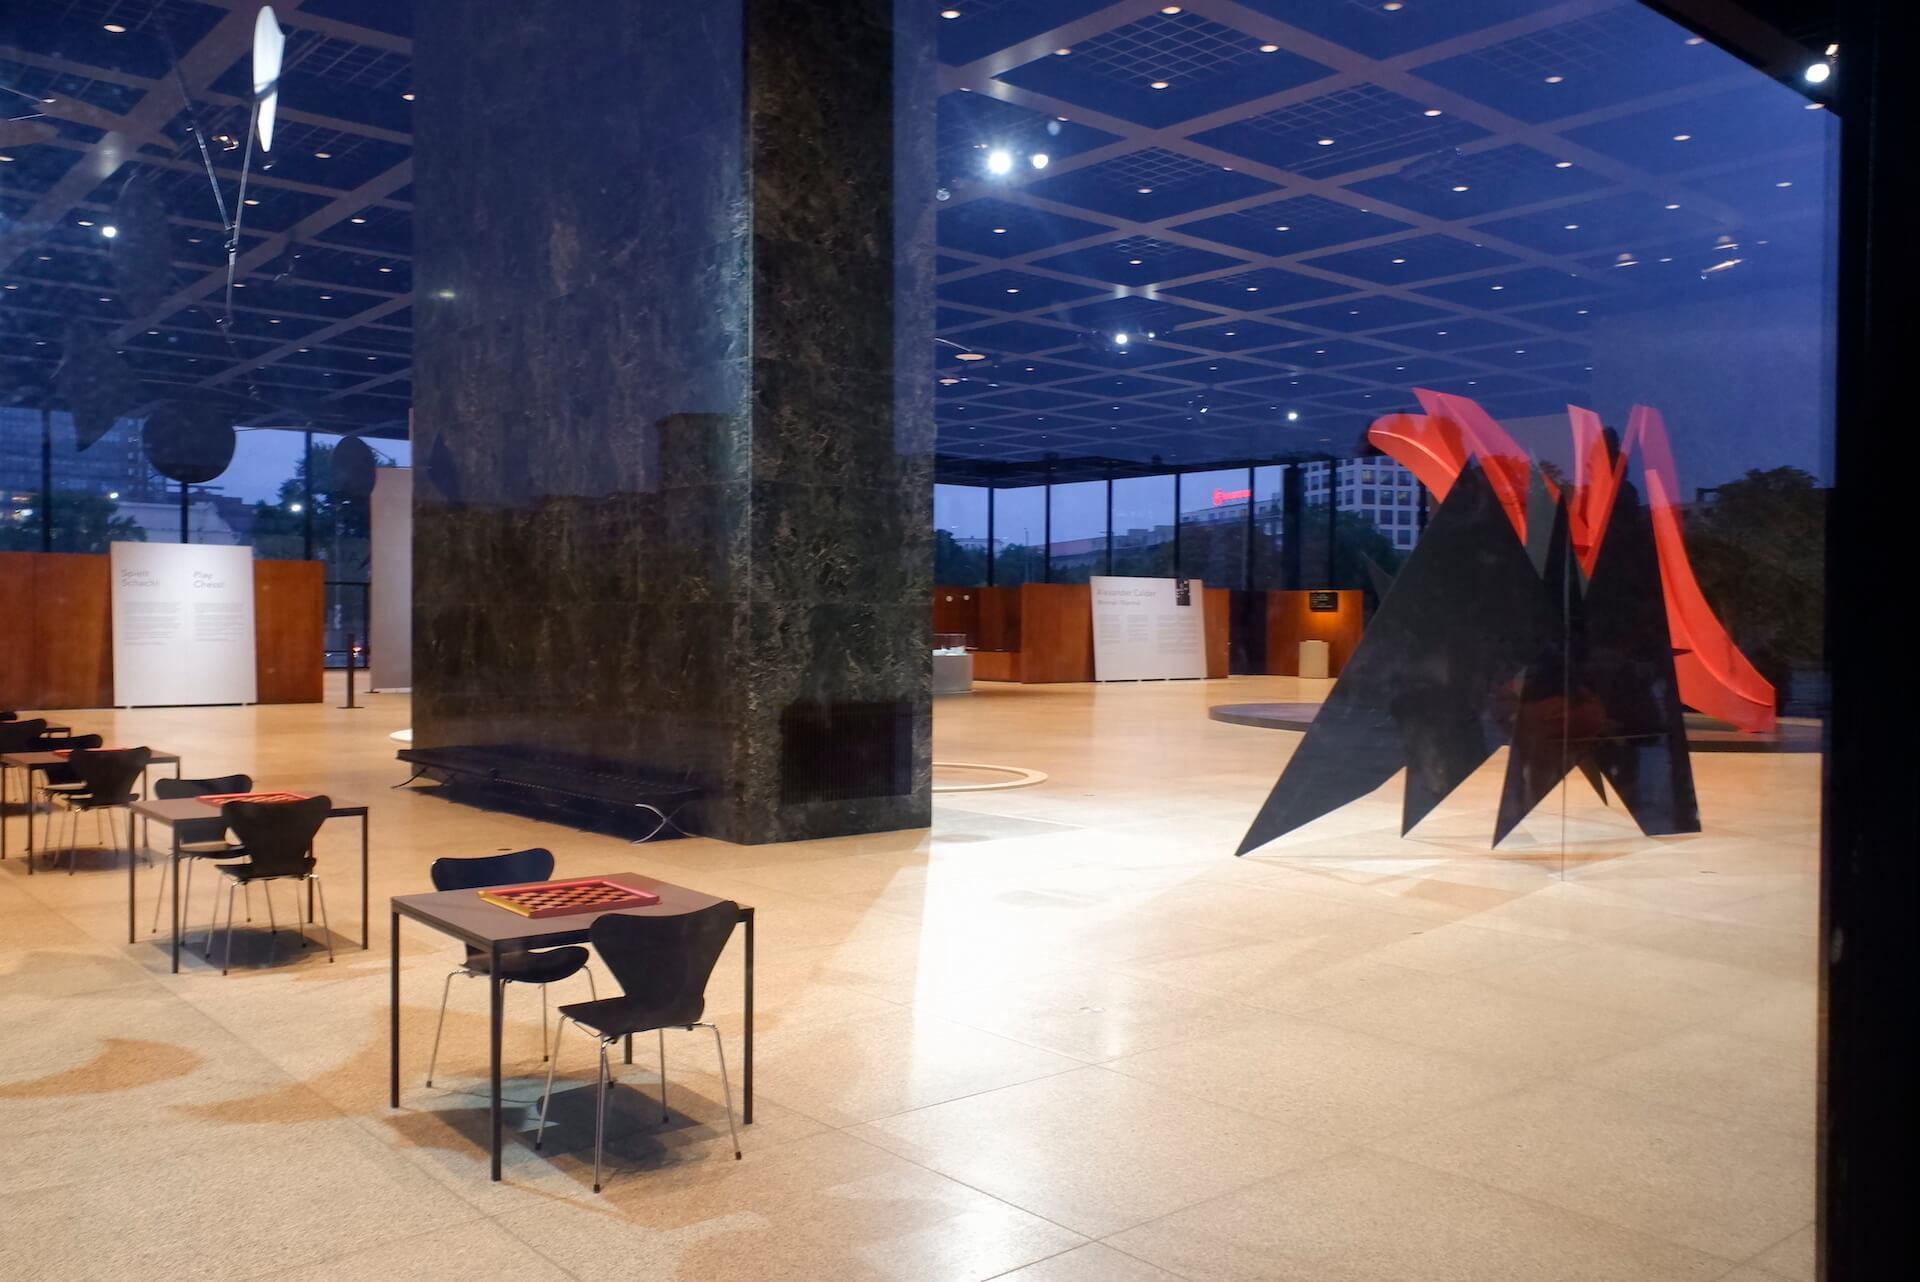 『Berlin Art Week』現地レポート 進化し変化し続けるベルリンのアートカルチャー column210929kana-miyazawa-04